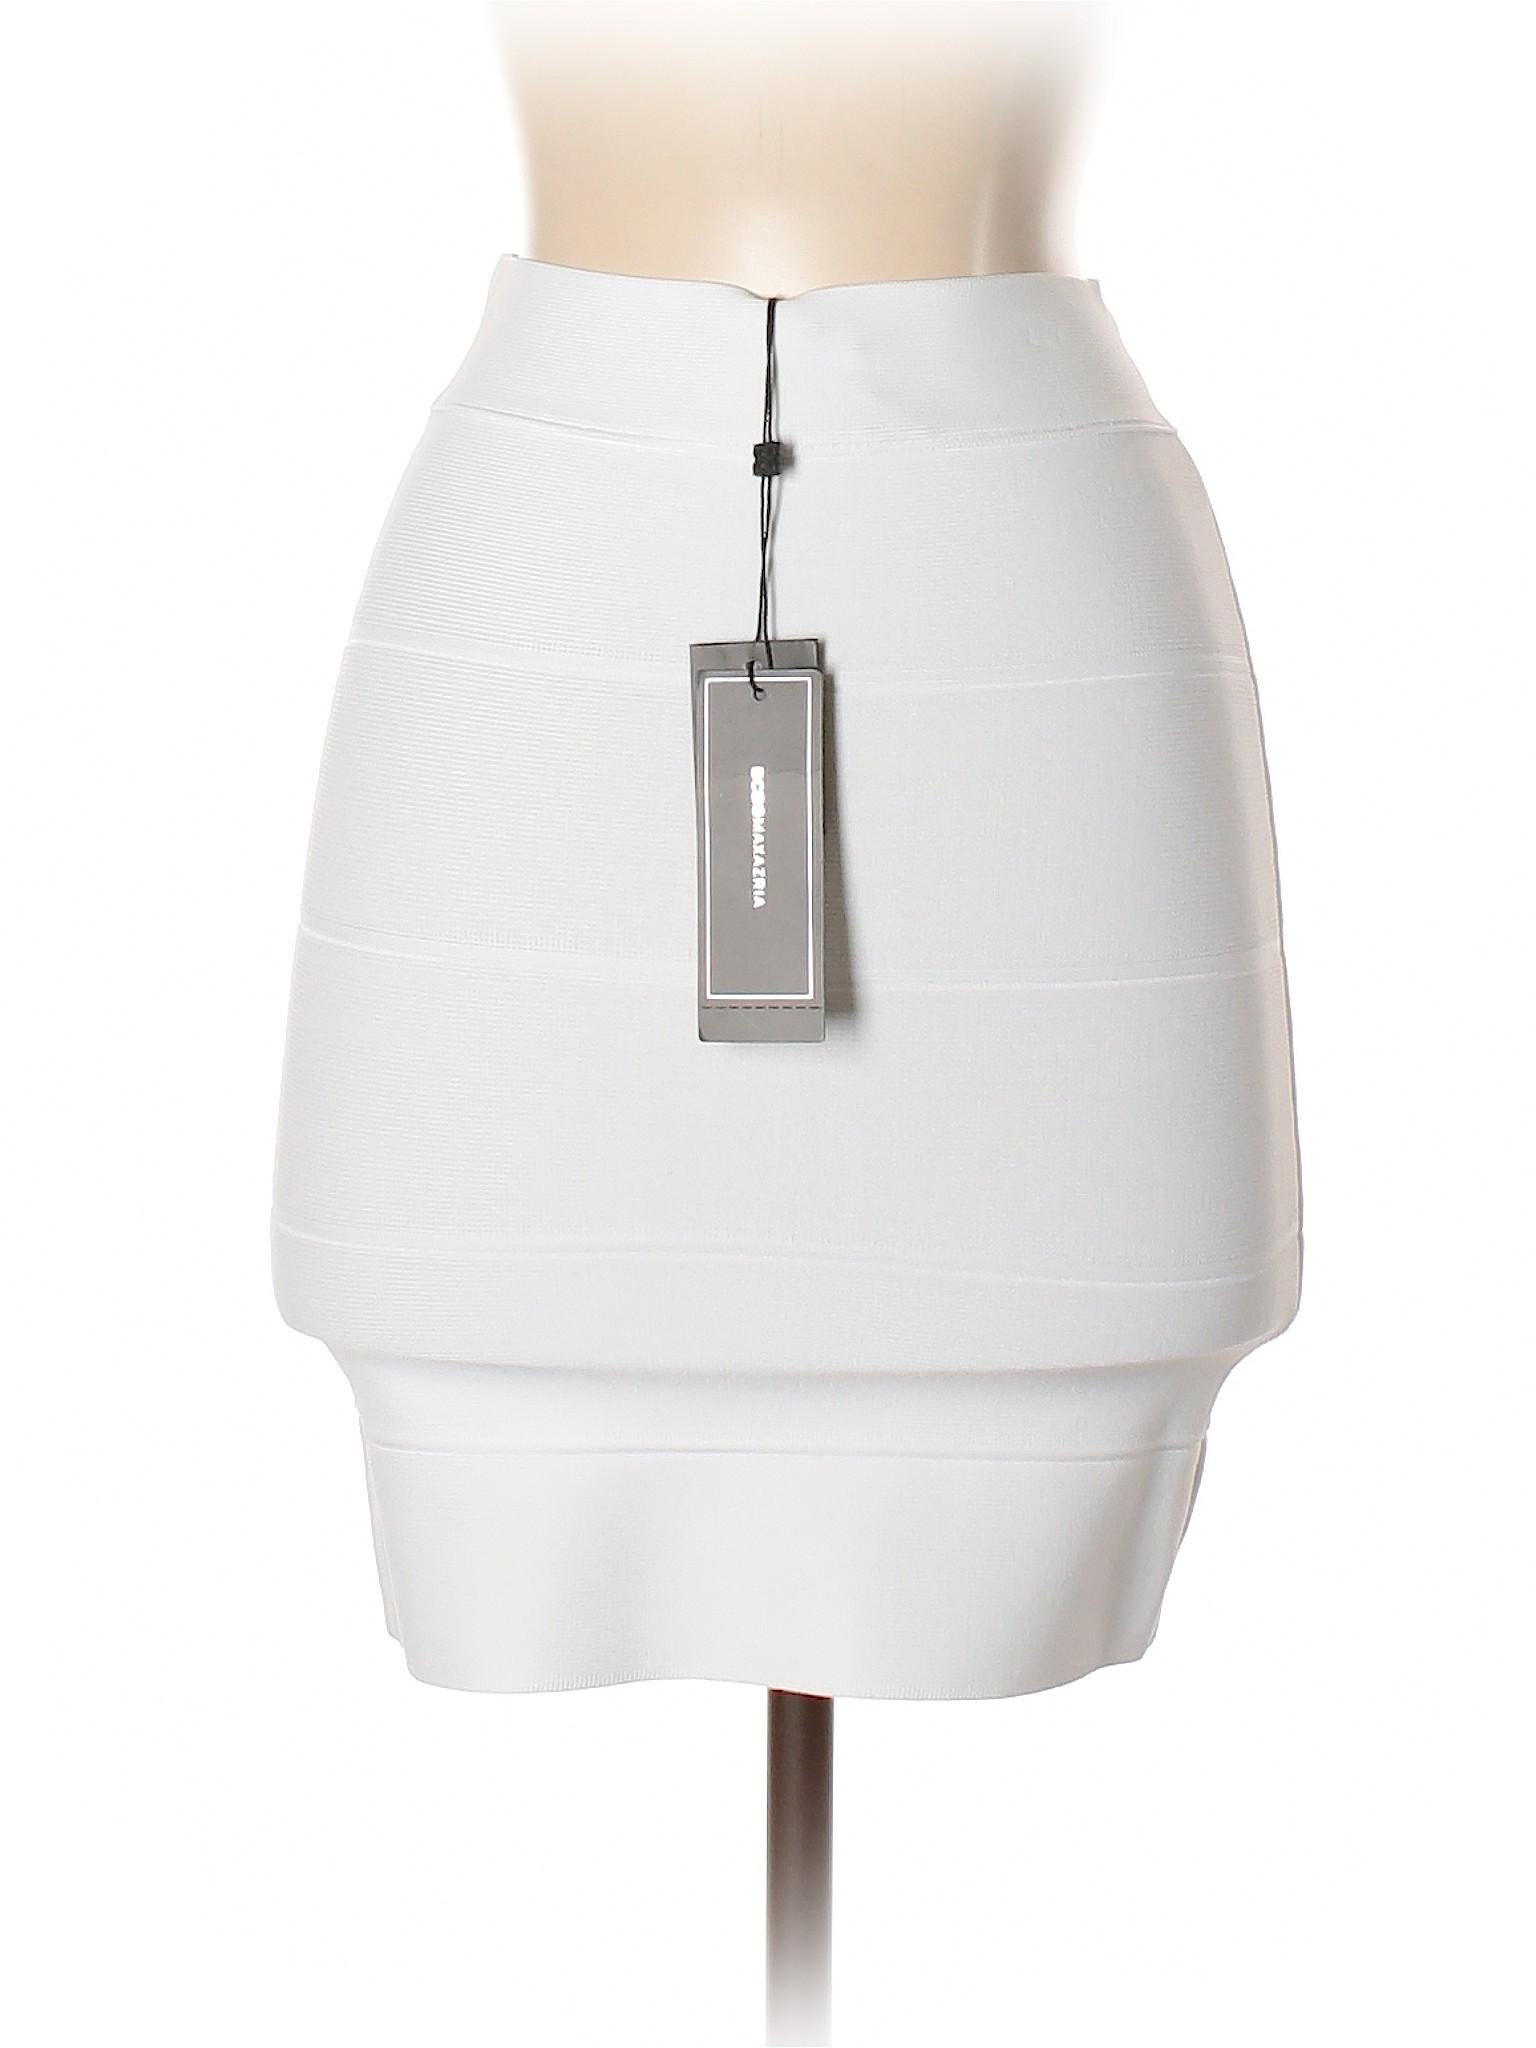 Casual leisure Skirt Boutique leisure BCBGMAXAZRIA Boutique POqywIZz